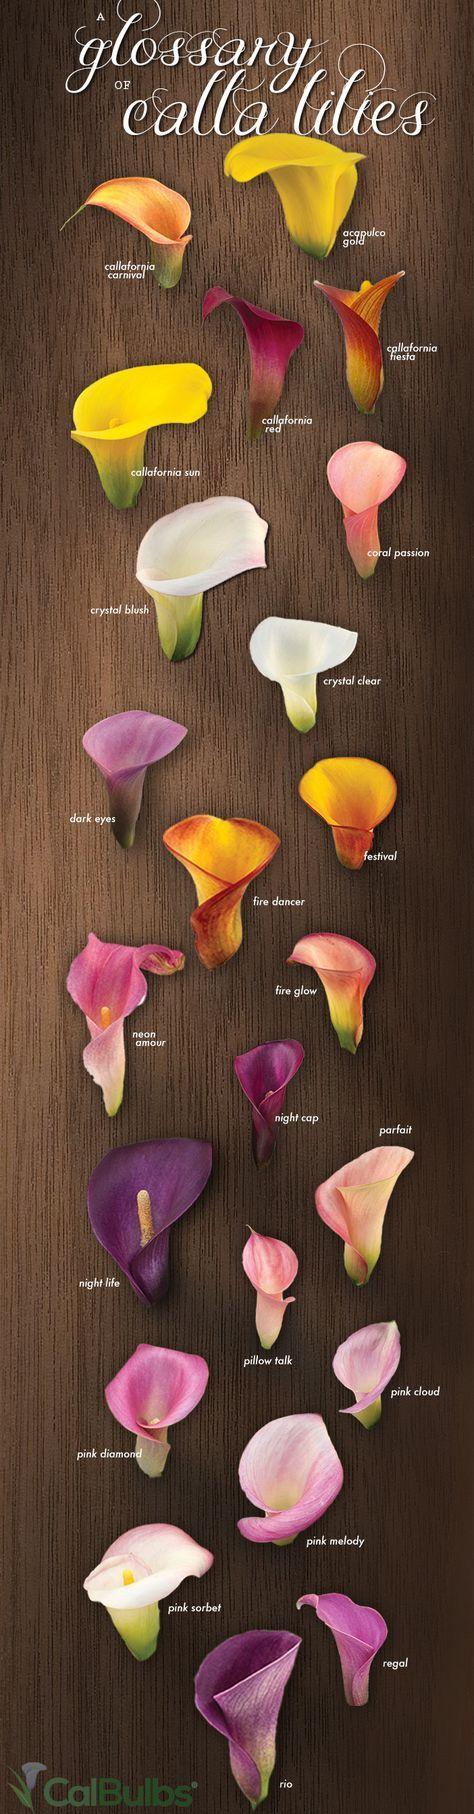 A Glossary of Calla Lilies - Calla Lily Colors Infograph!   CalBulbs.com